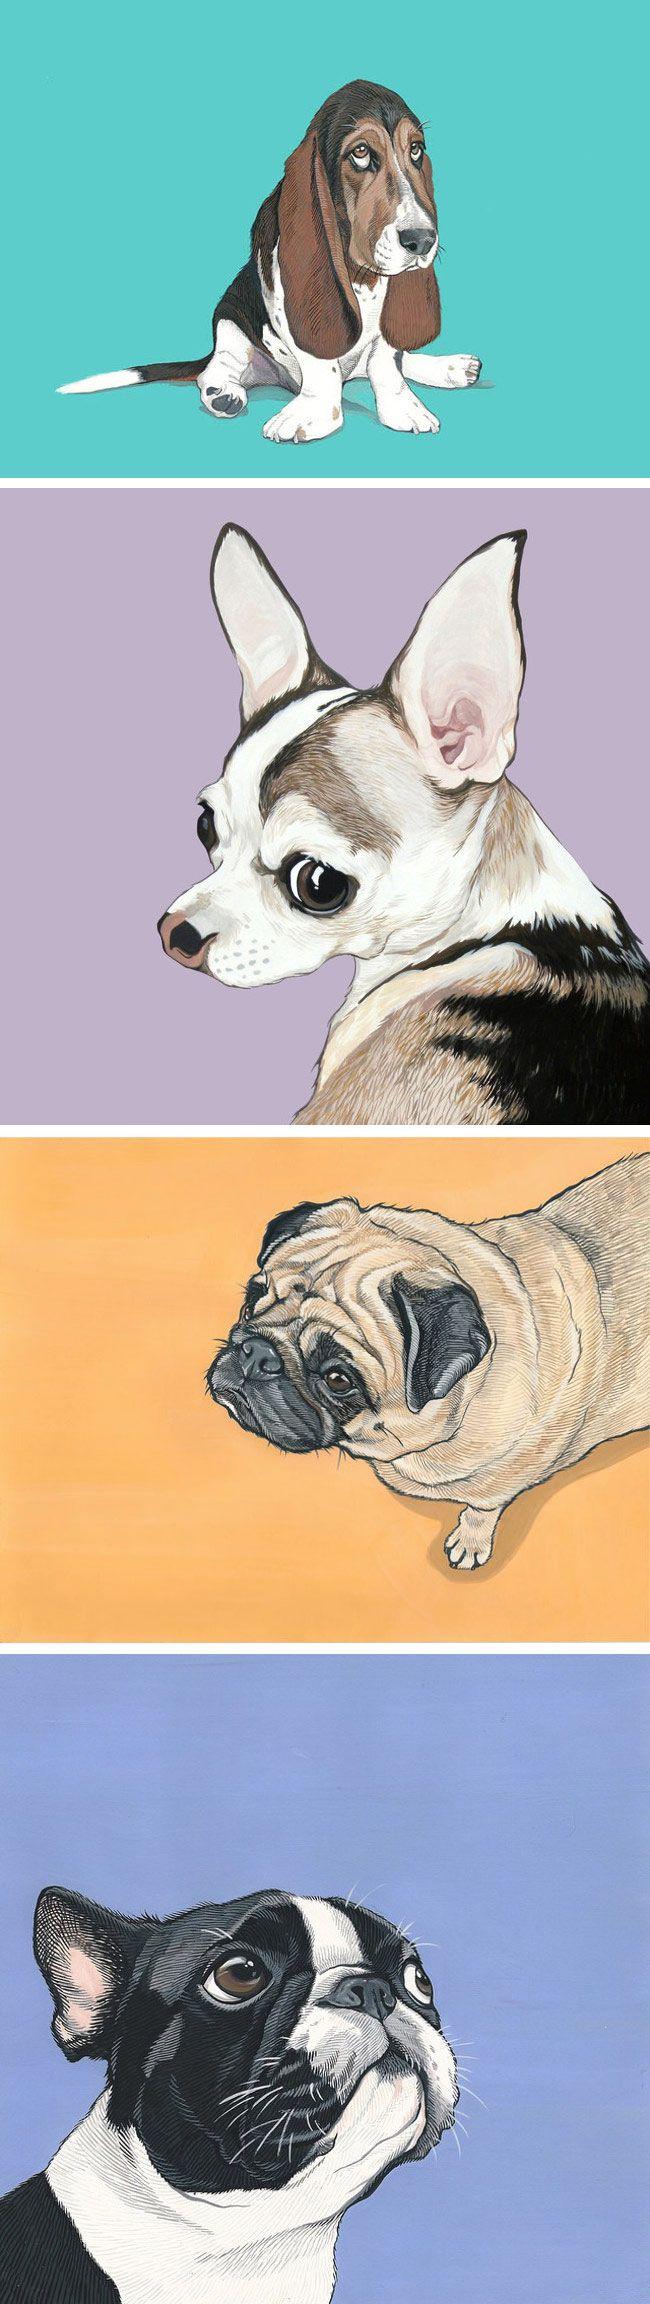 Custom popart style pet portraits by manda wolfe the pet